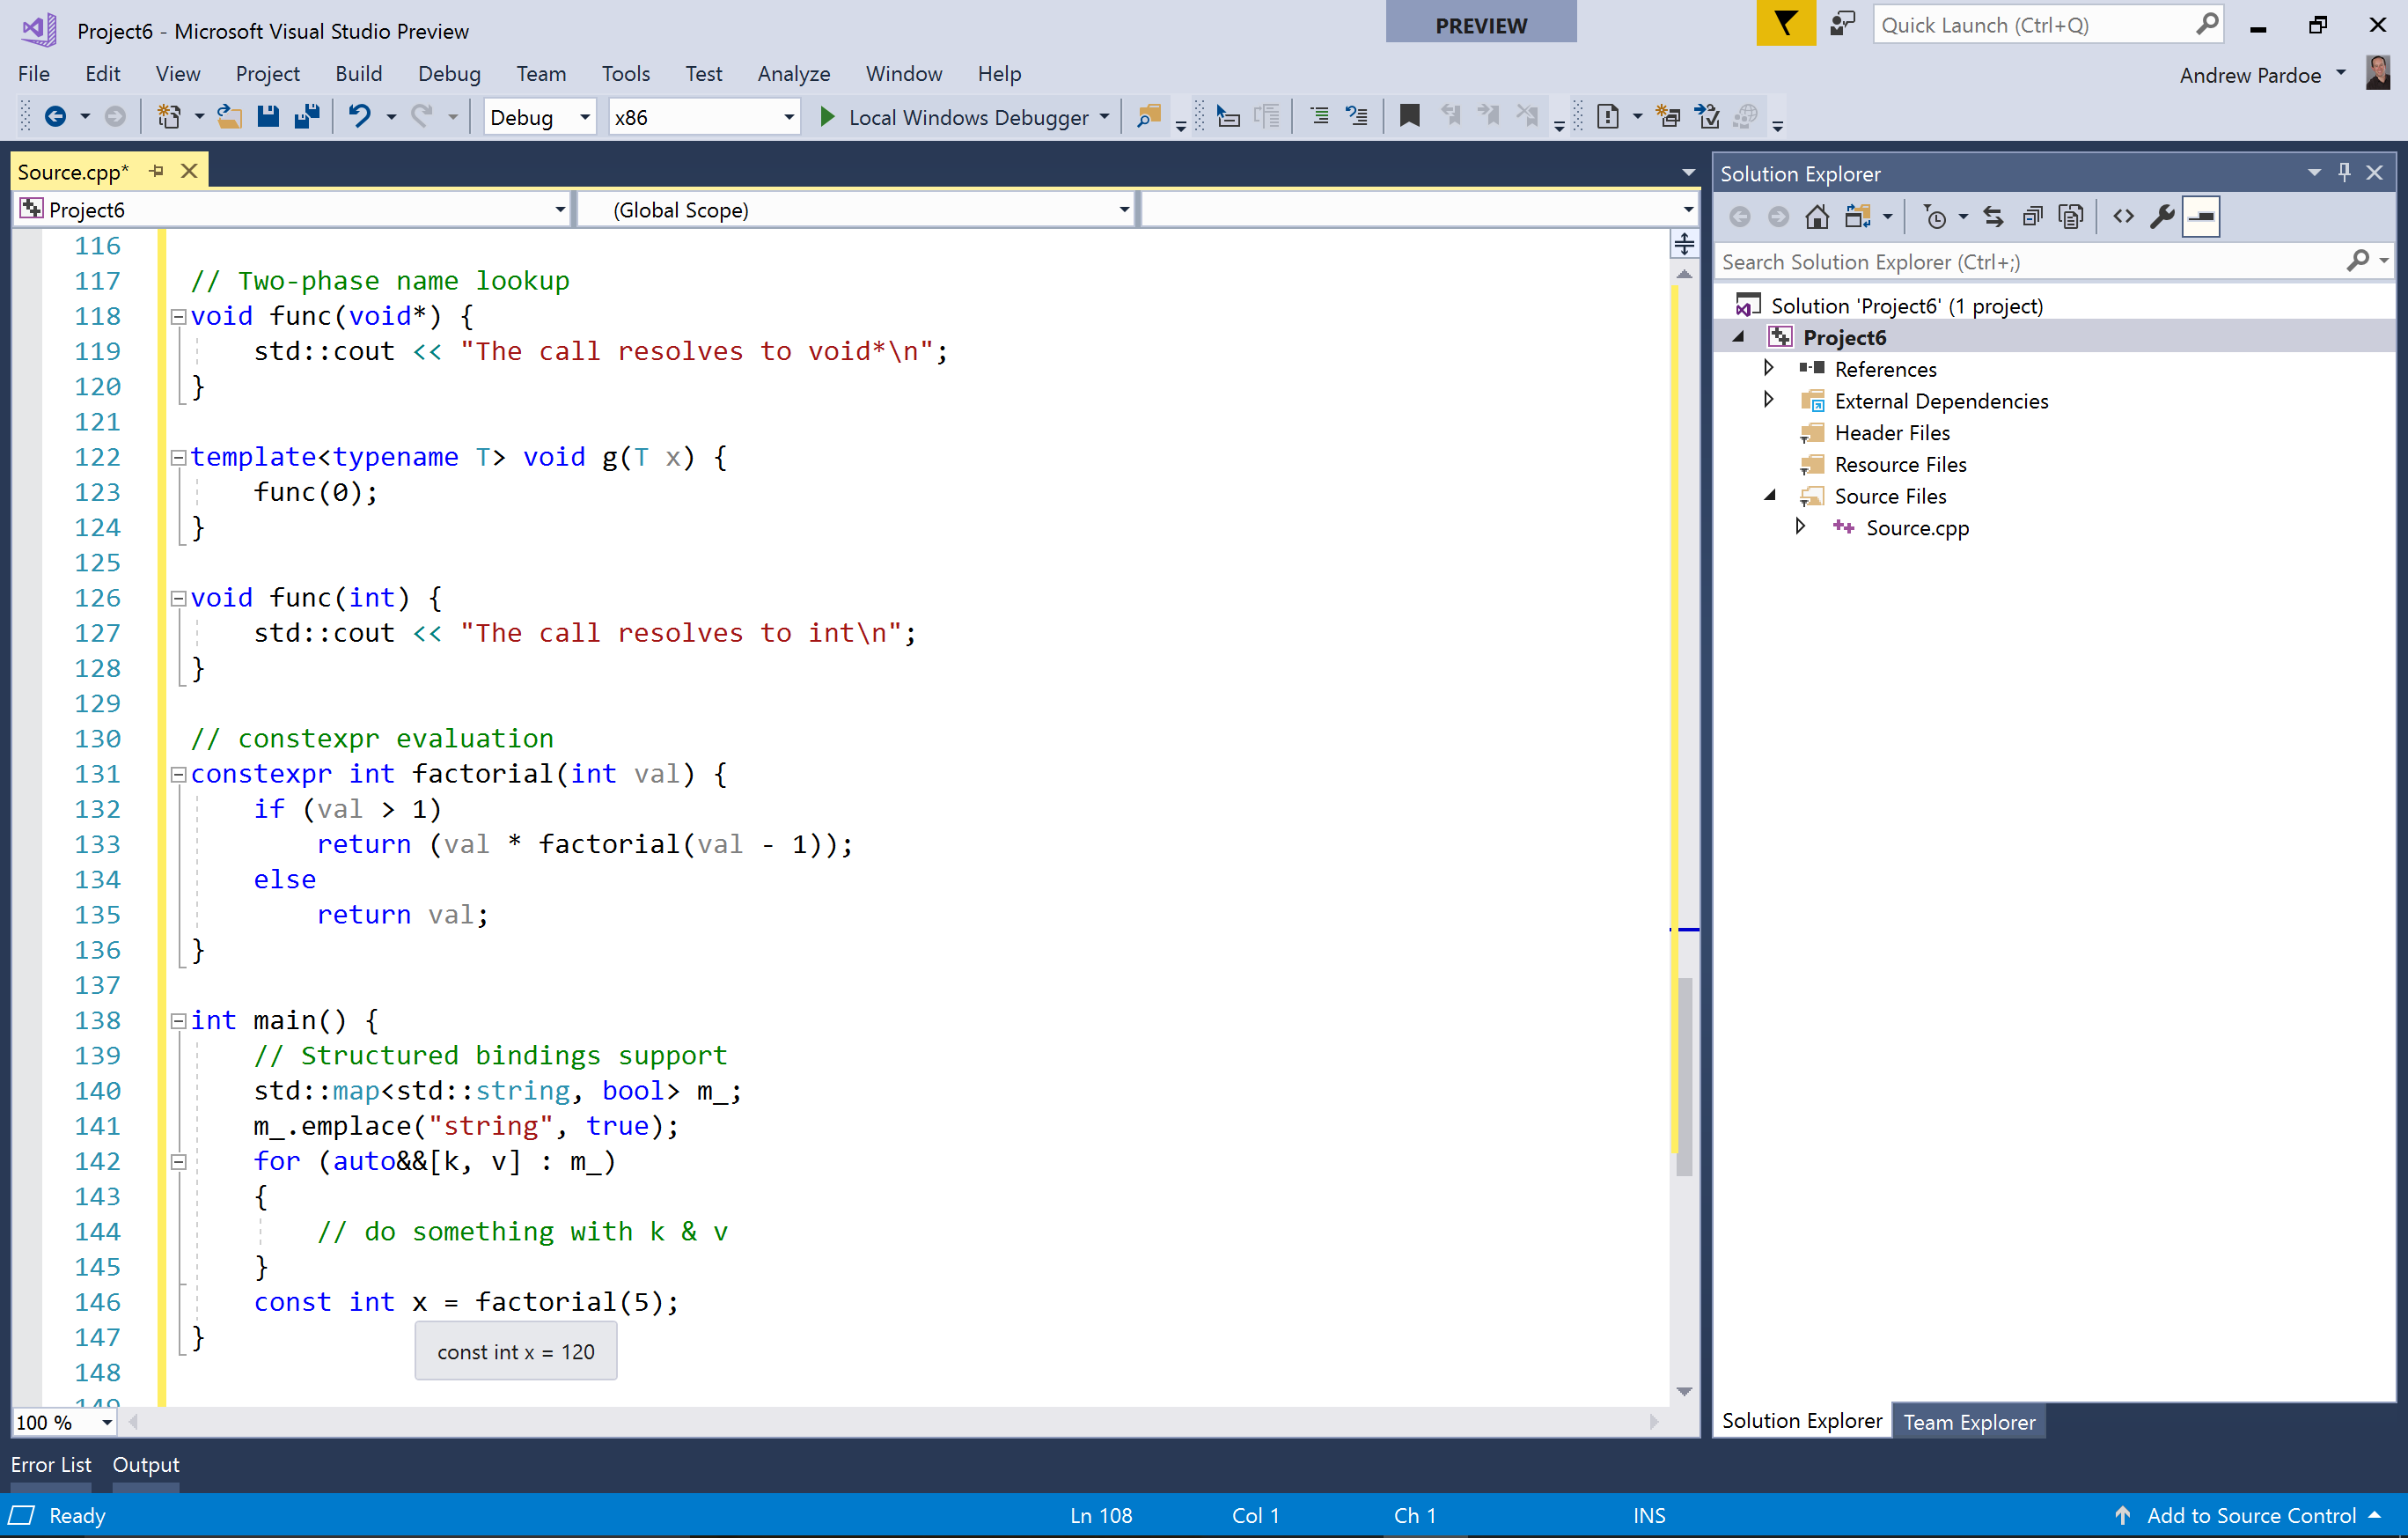 Интерфейс приложения Microsoft Visual